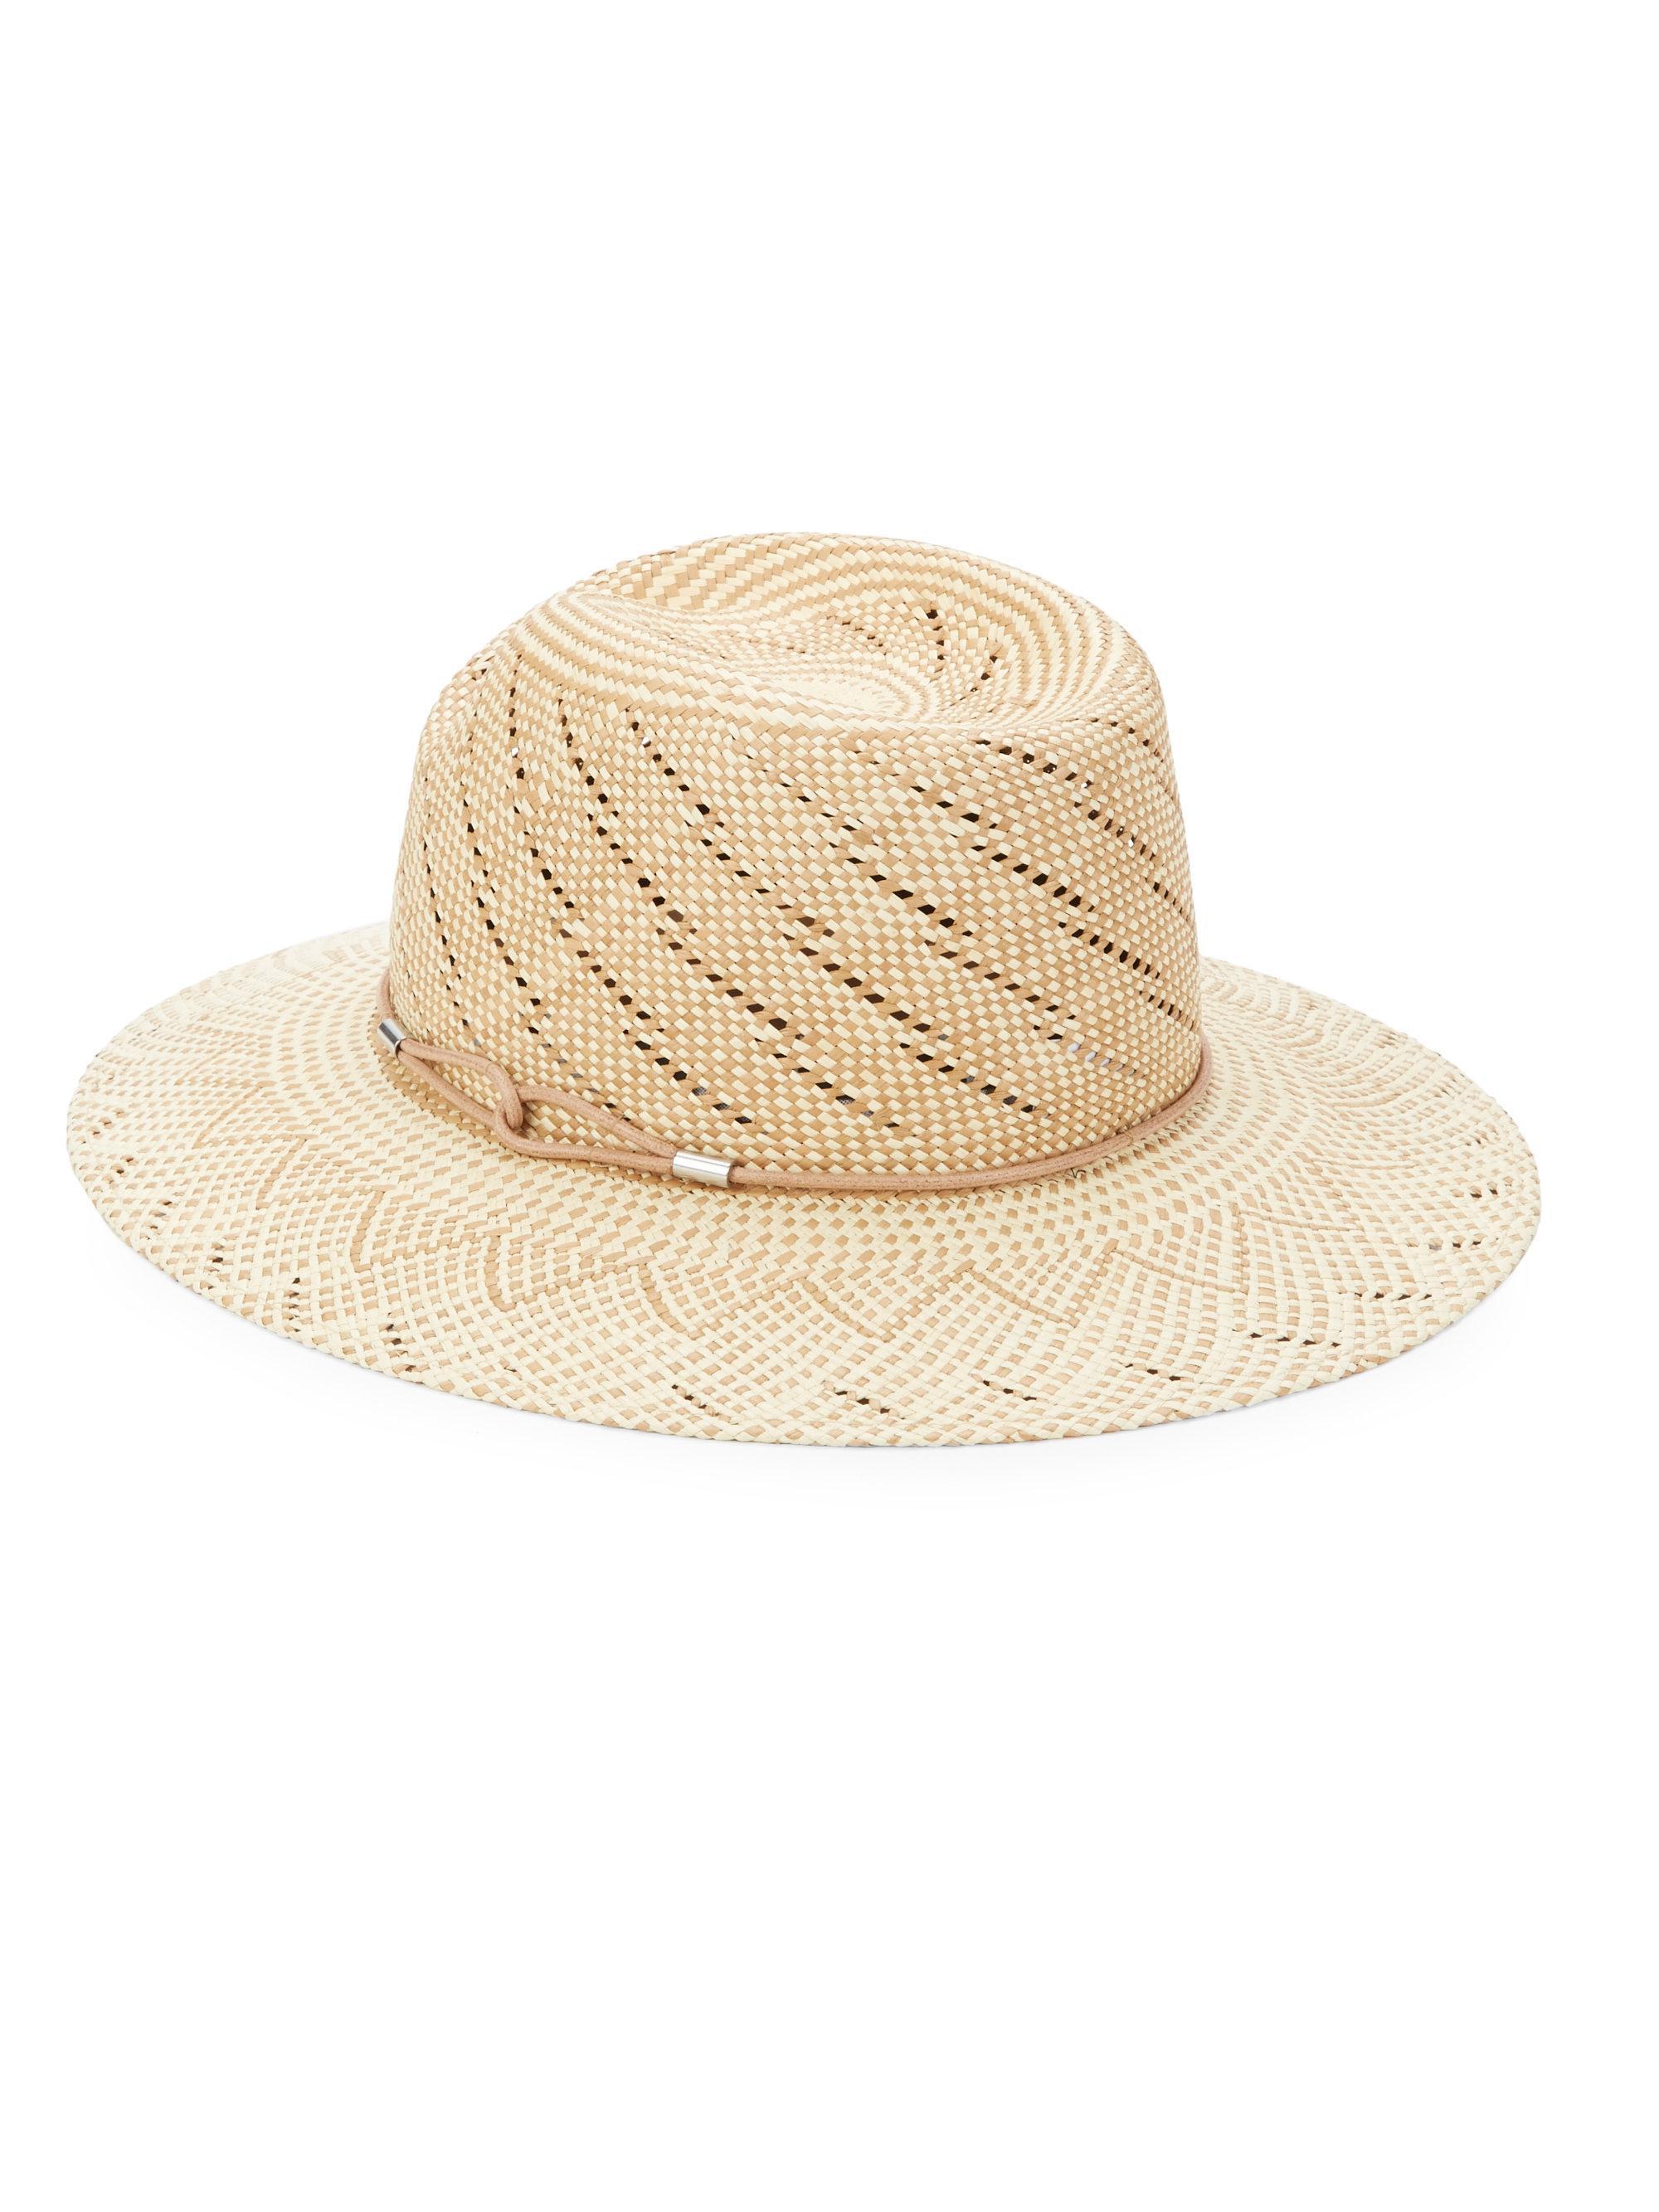 Rag   Bone Zoe Straw Hat in Natural - Lyst 276a9ff9dcb5